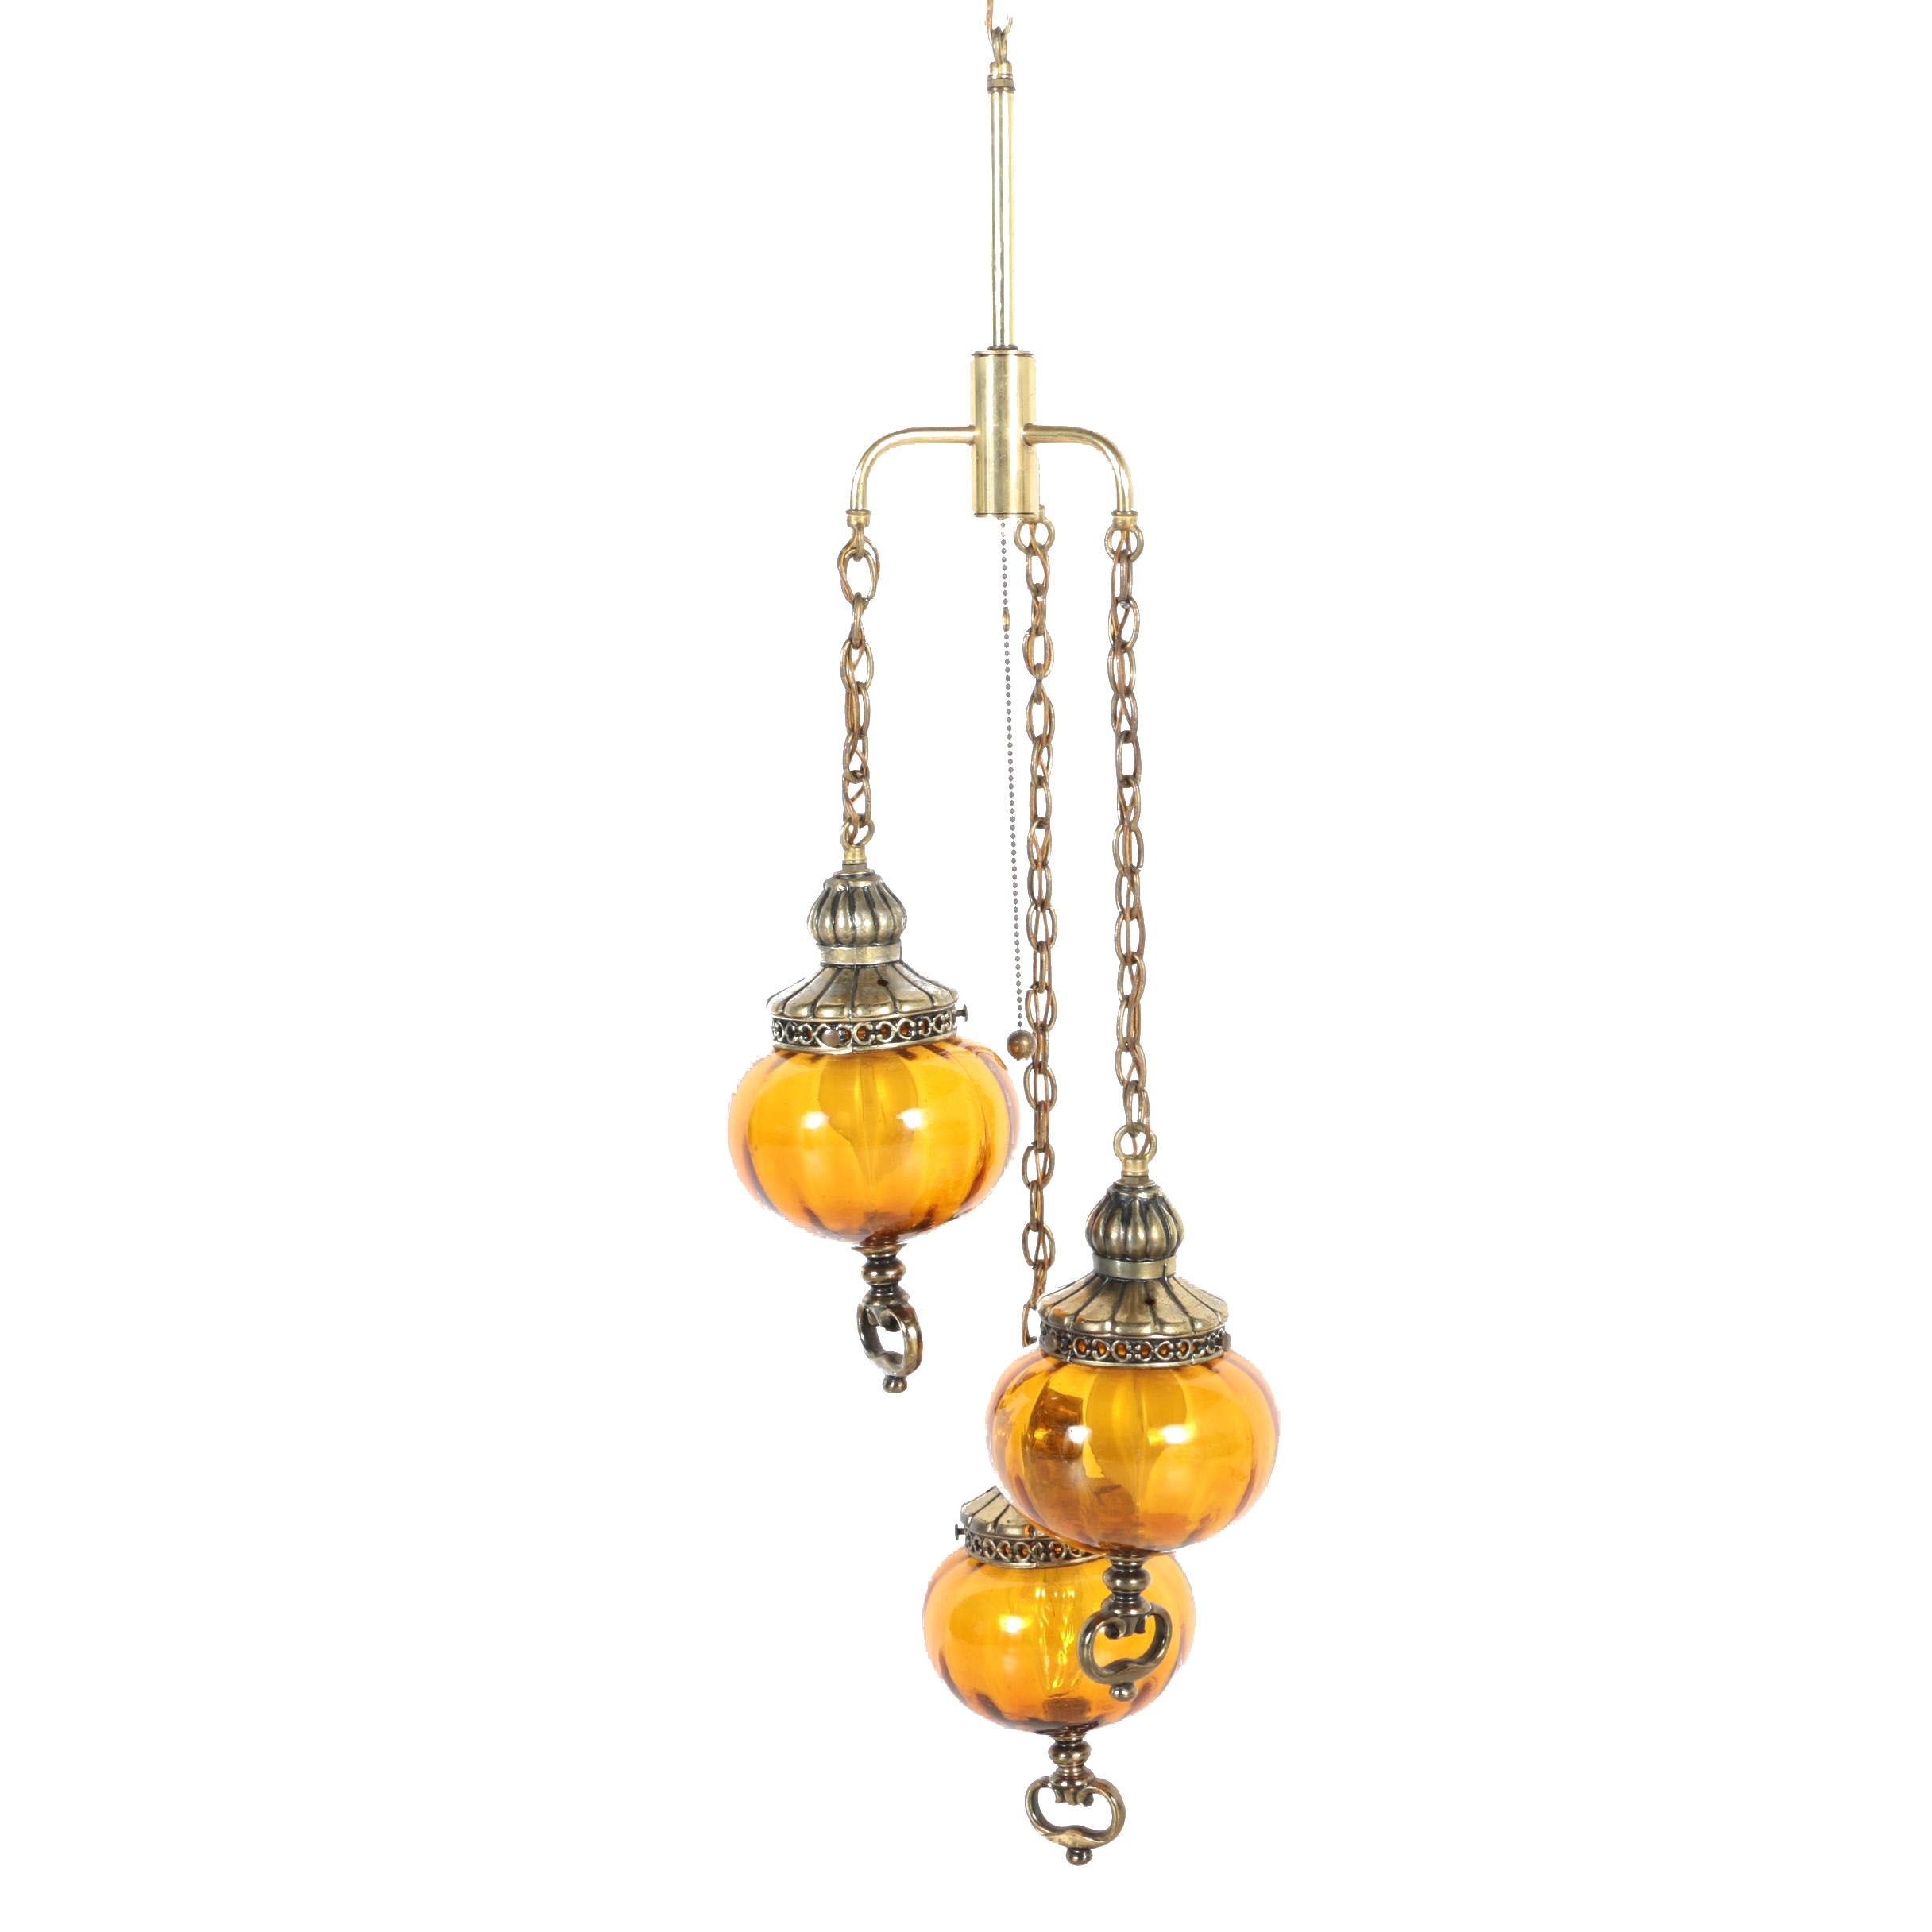 Vintage Three-Pendant Hanging Light Fixture